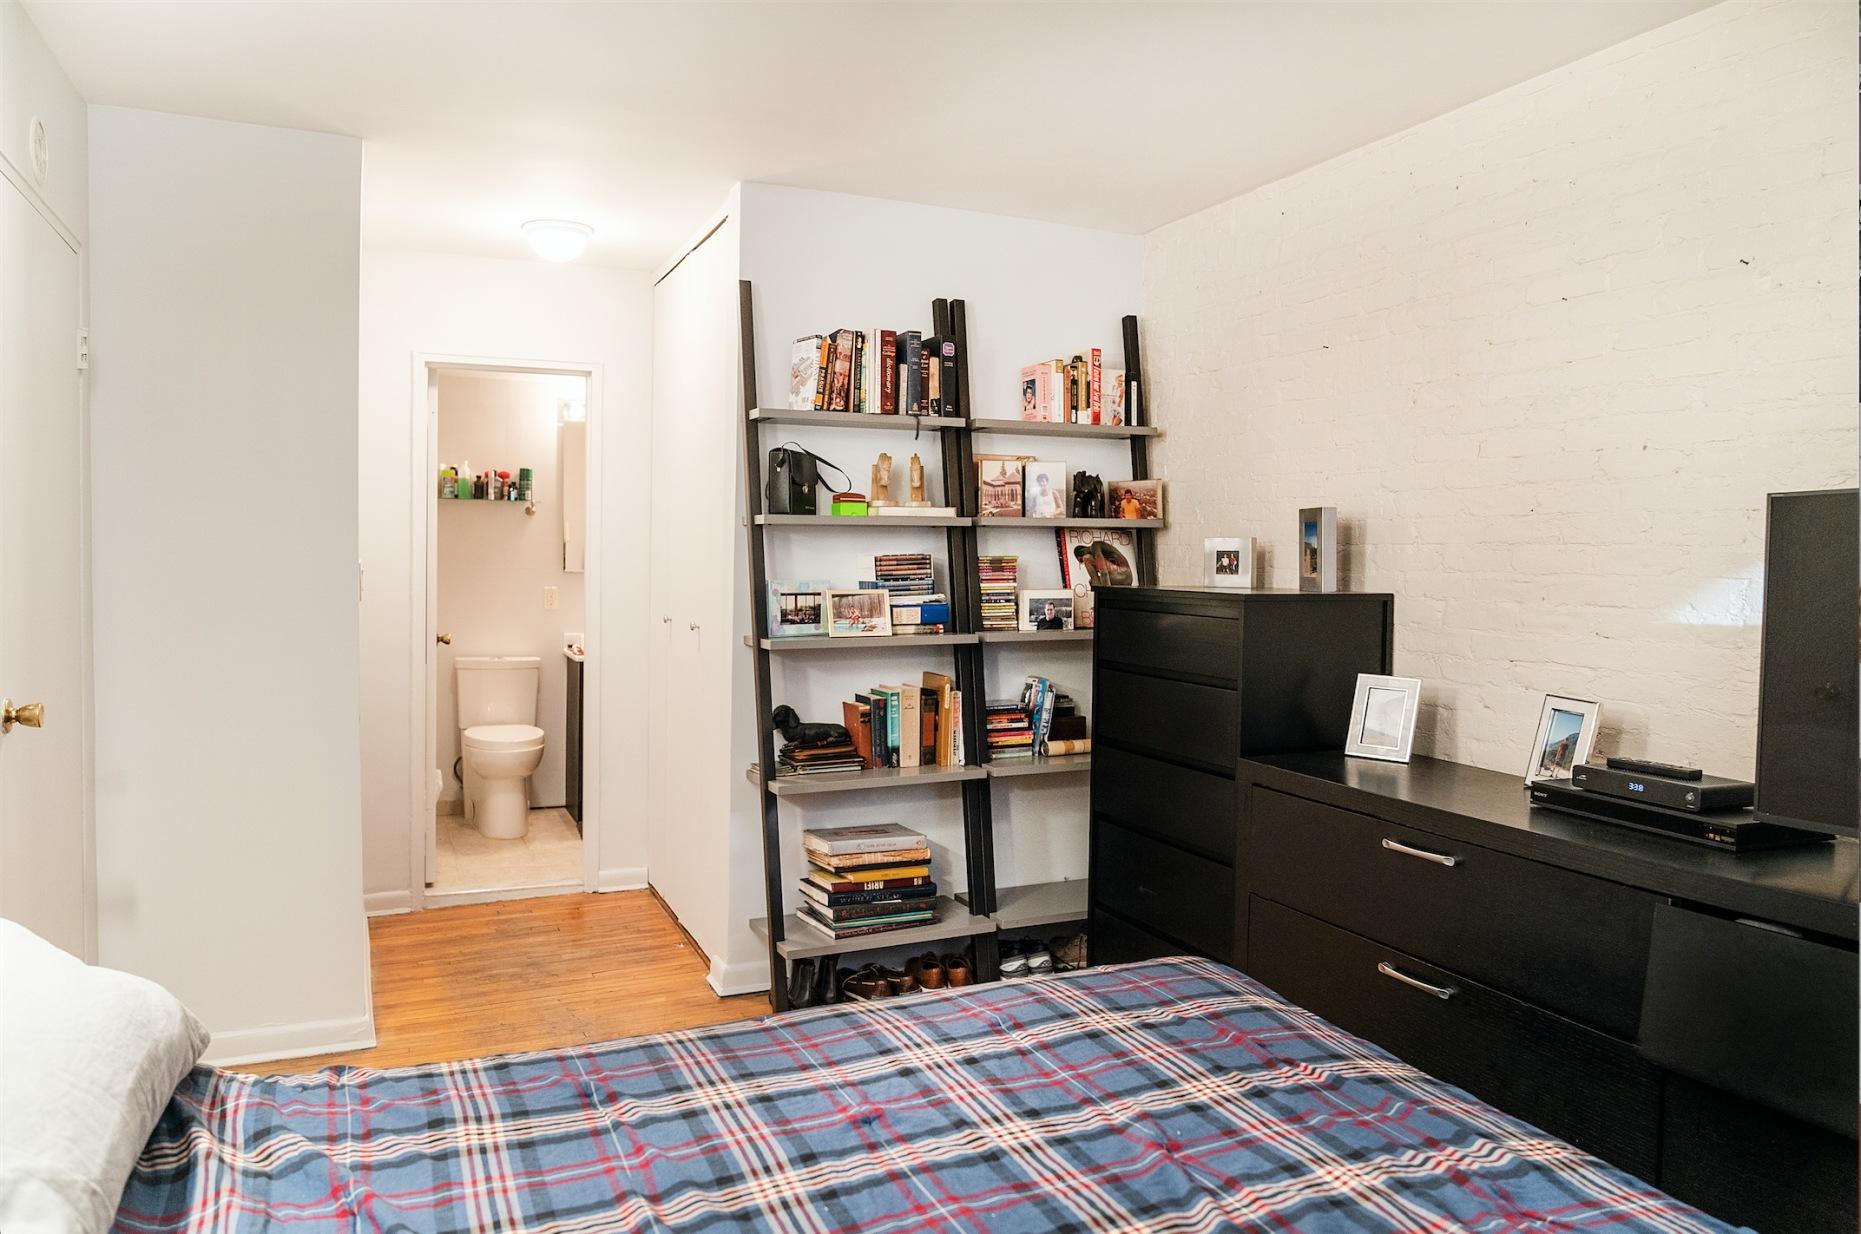 323 East 21st Street Gramercy Park New York NY 10010